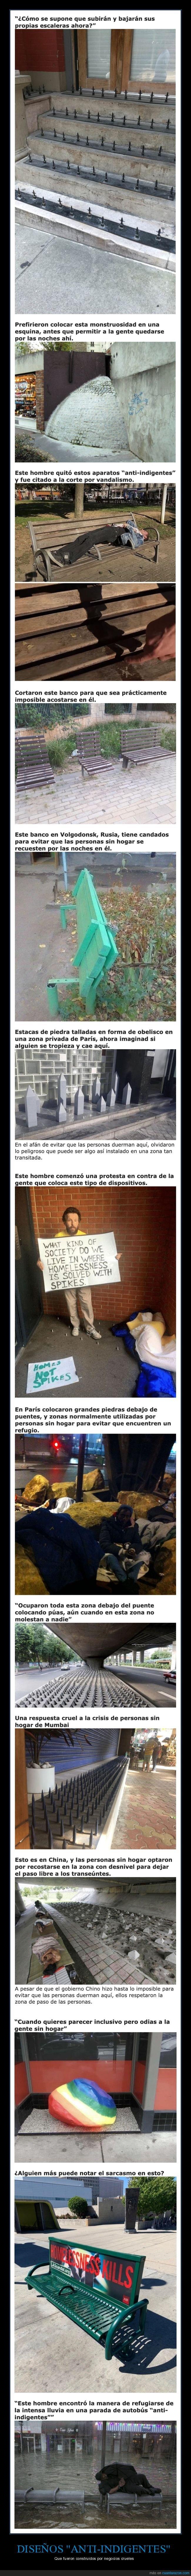 anti-indigentes,indigentes,sin hogar